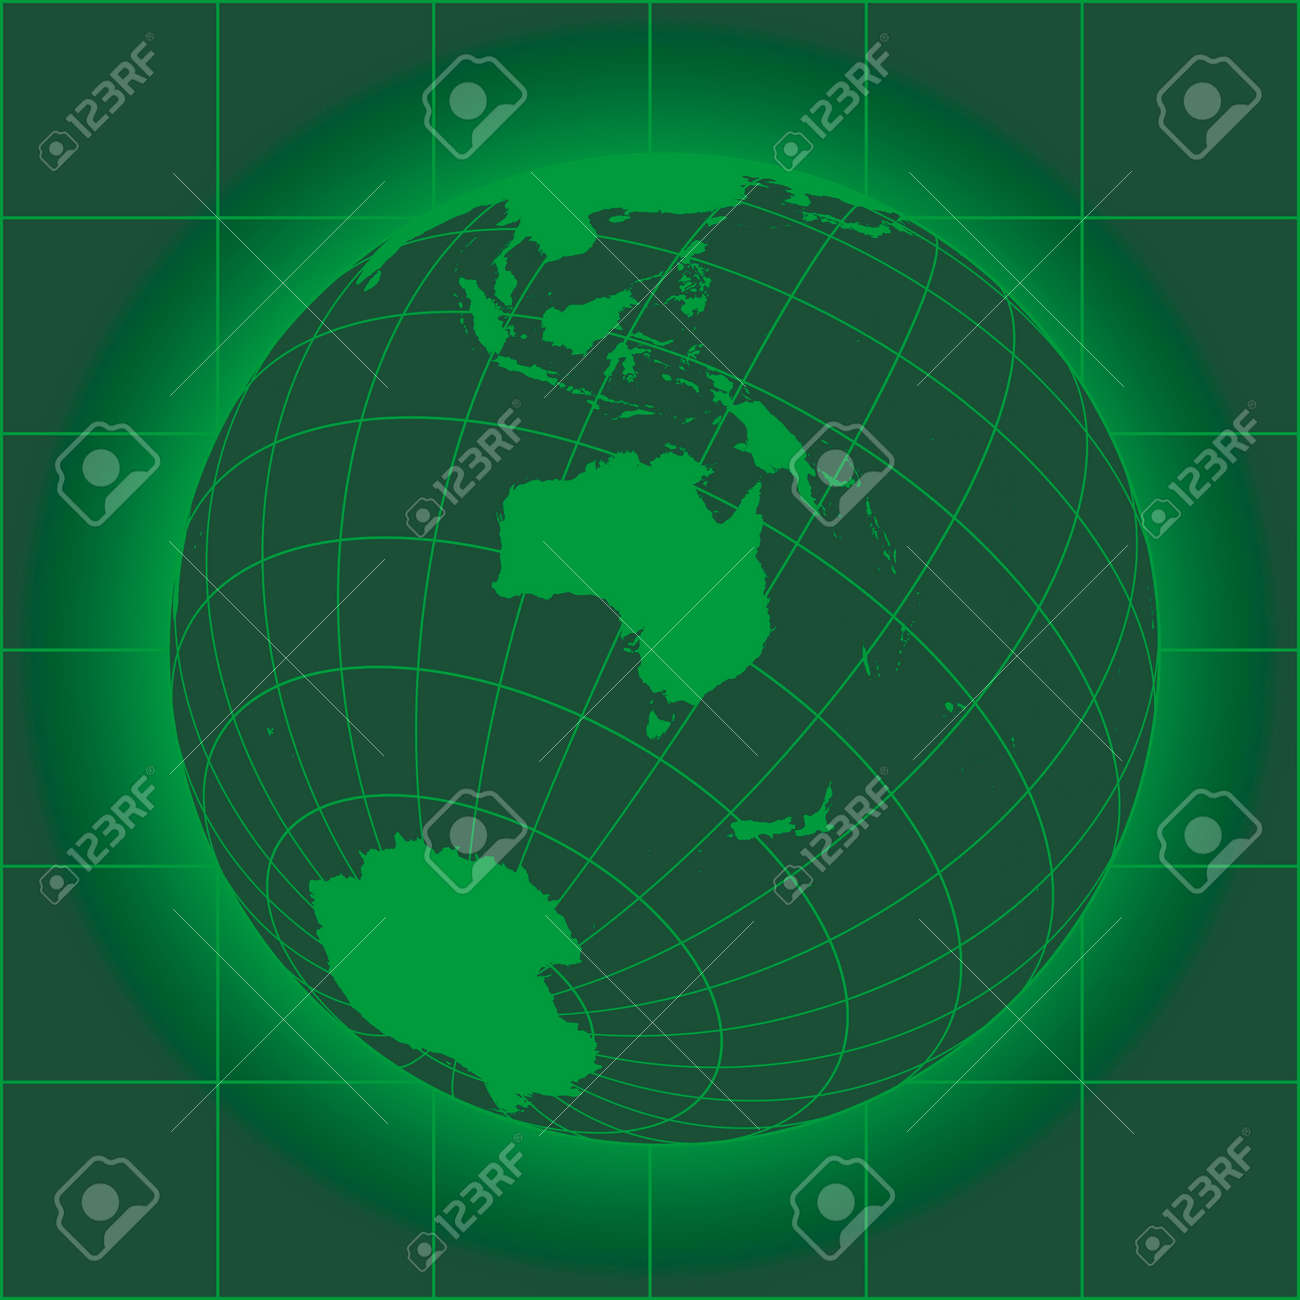 Green australia map asia russia antarctica north pole earth green australia map asia russia antarctica north pole earth globe gumiabroncs Choice Image